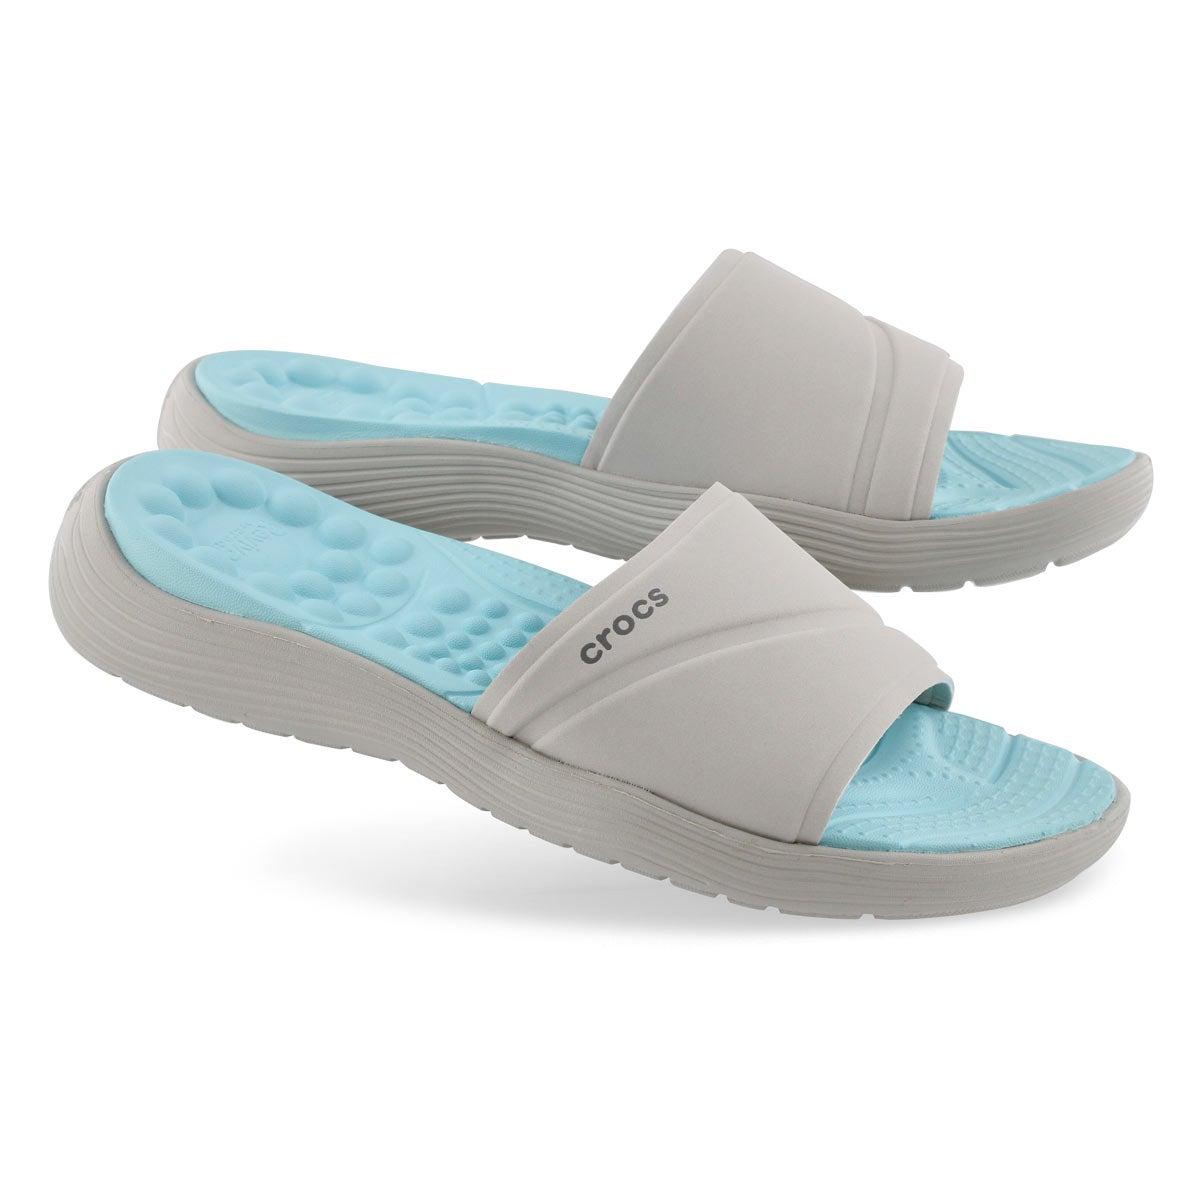 Sandale enfil.Reviva Slide,blc perle,fem